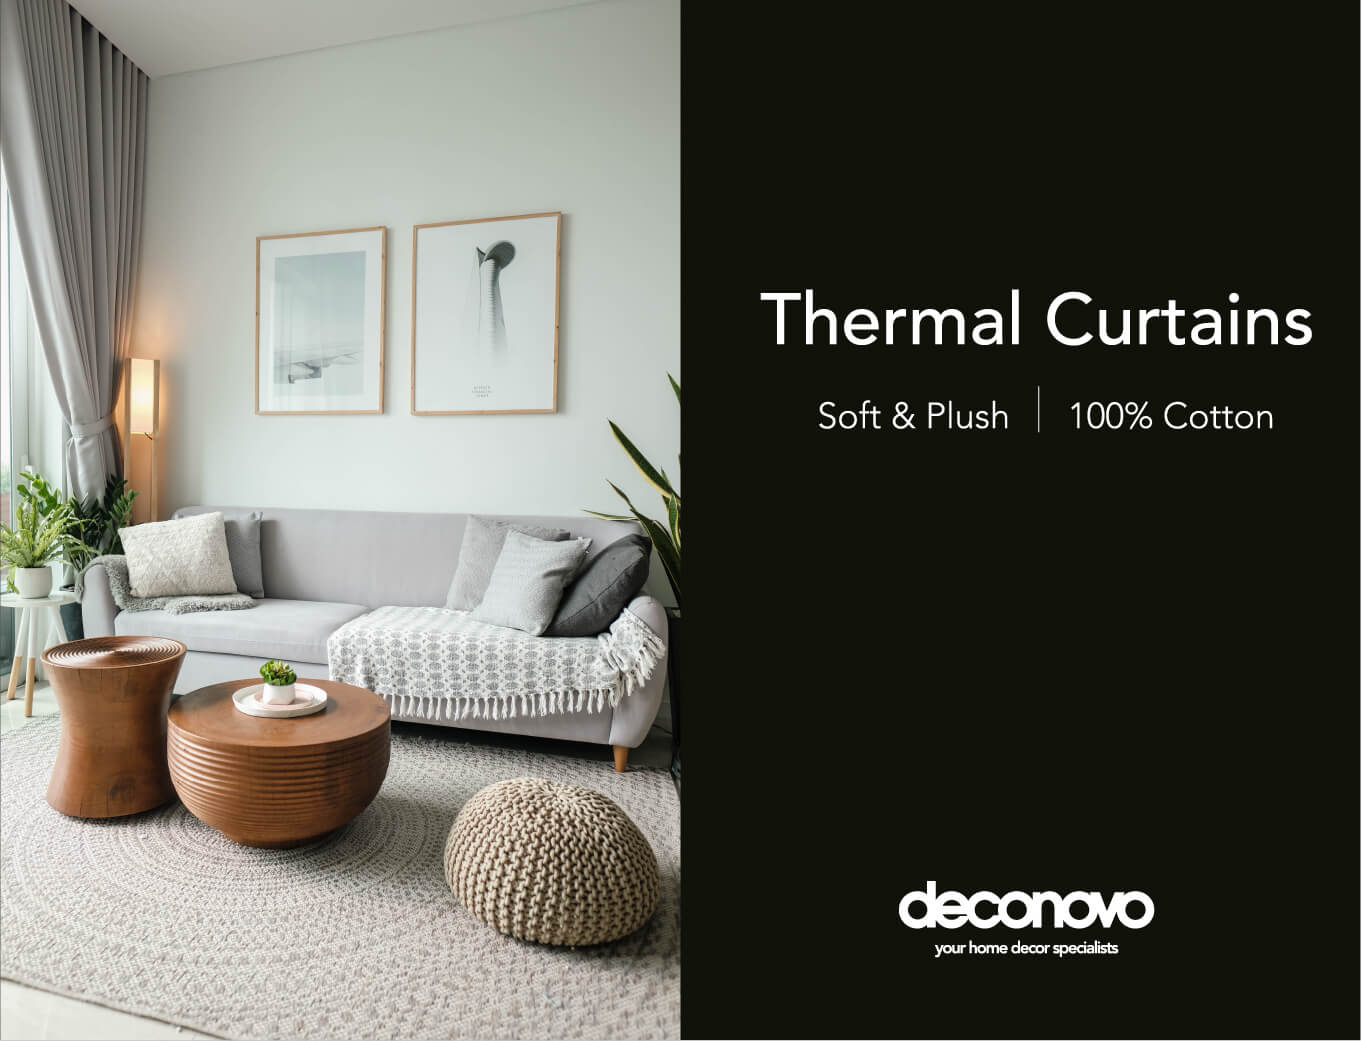 Deconovo-Ecommerce-Brand-Design-HomeDecoration-1361x1041